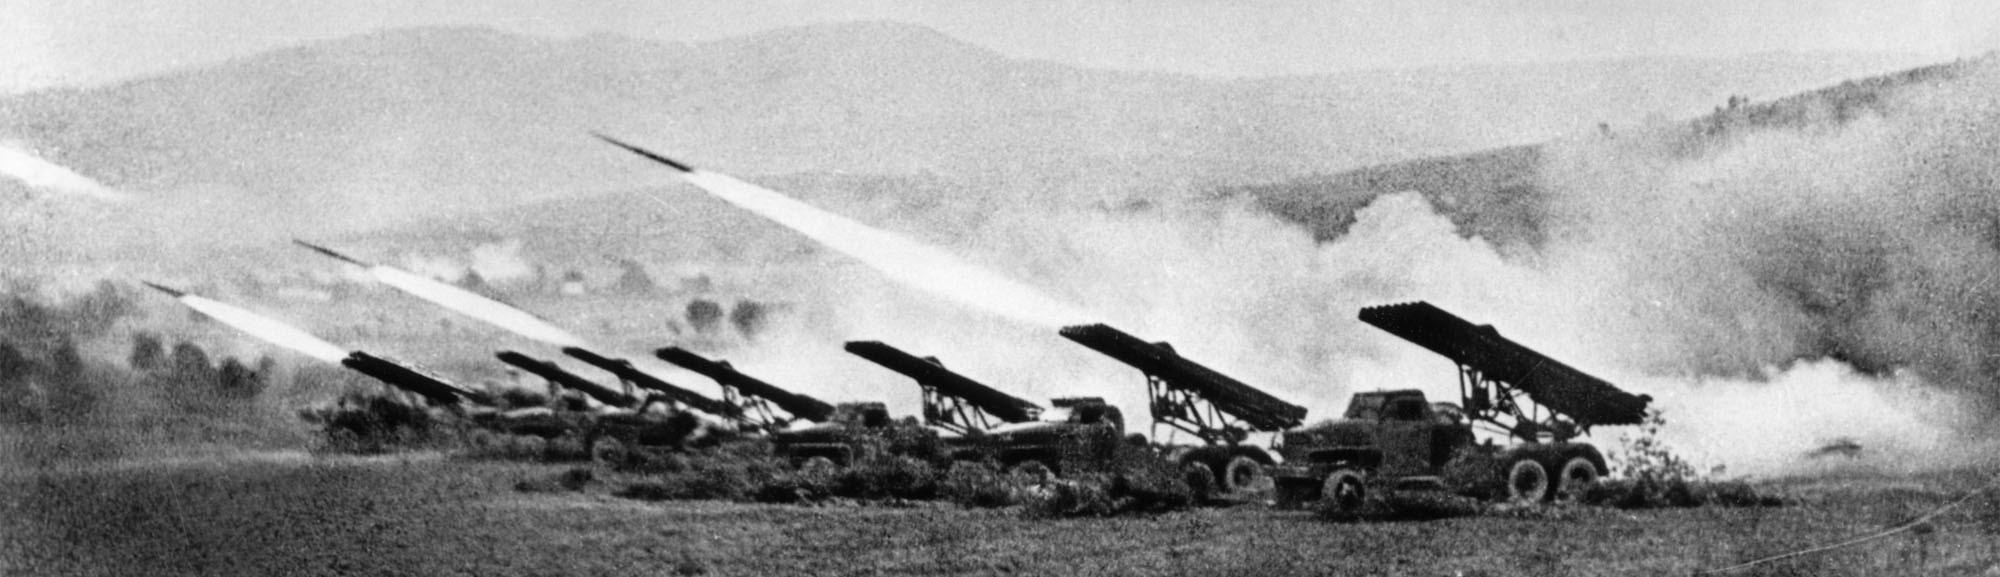 Славетні радянські «Катюші» монтувались на американських «Студебекерах»